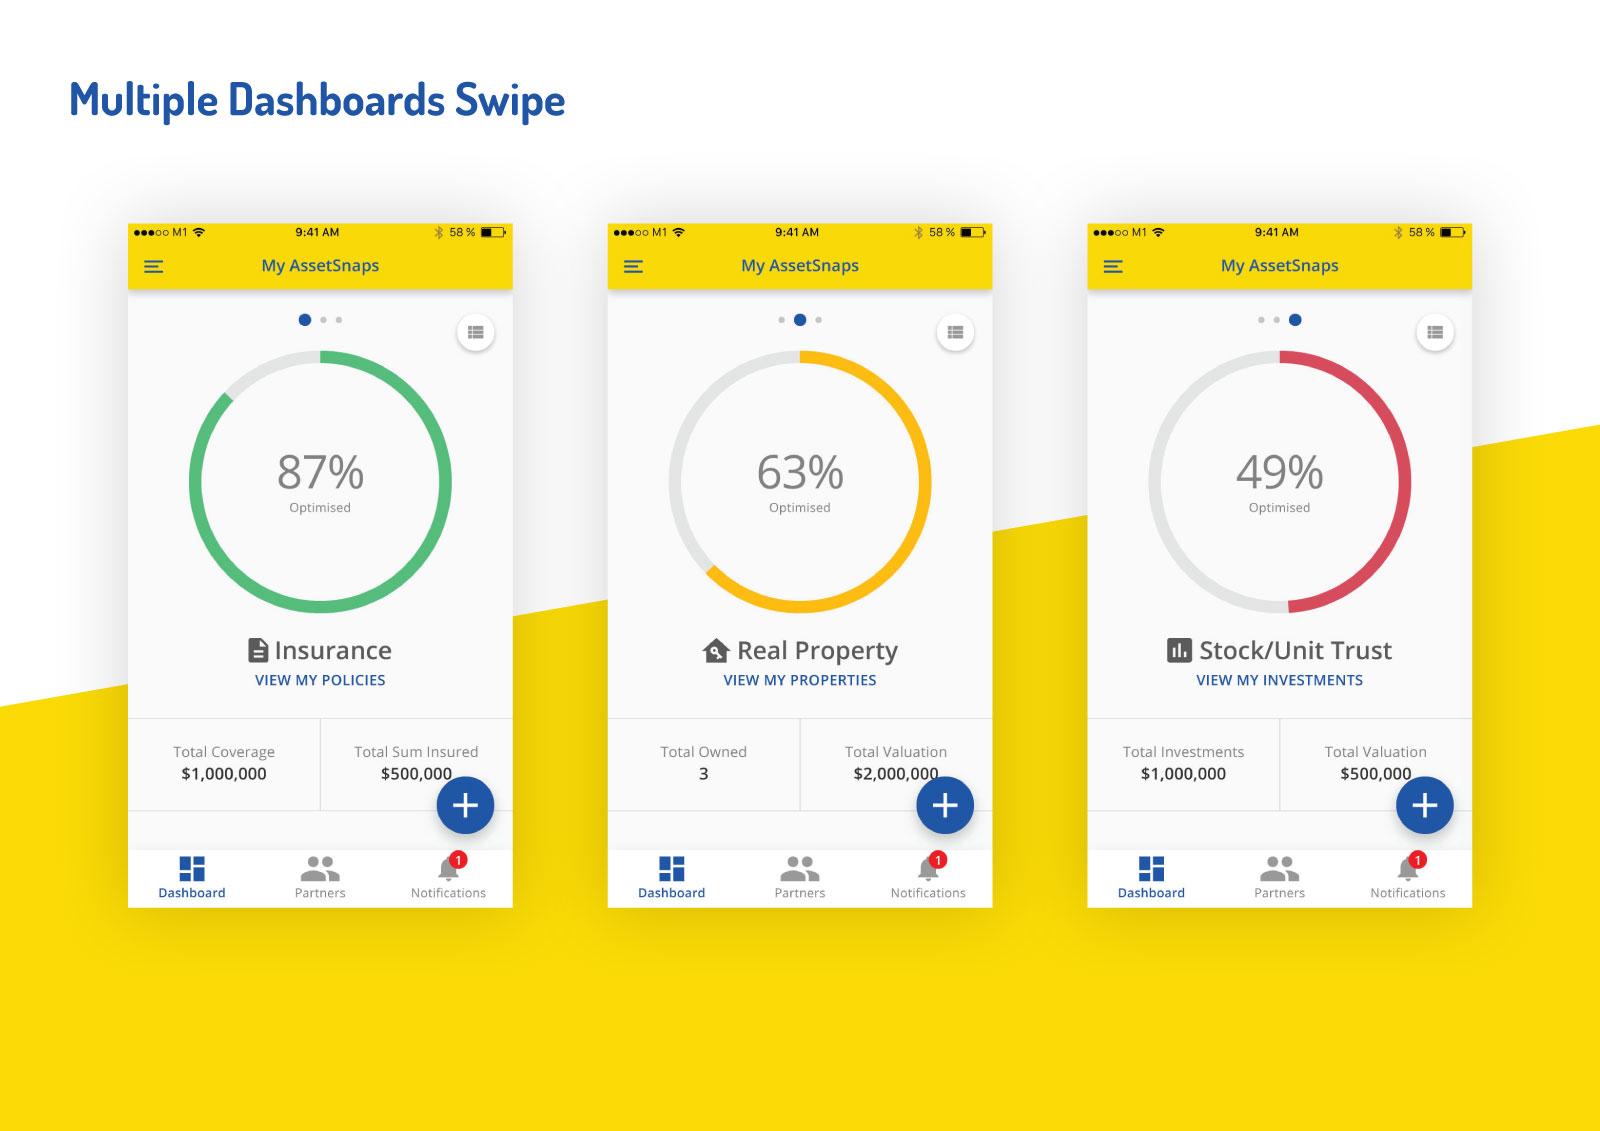 Asset Snaps - Multiple Dashboards Swipe